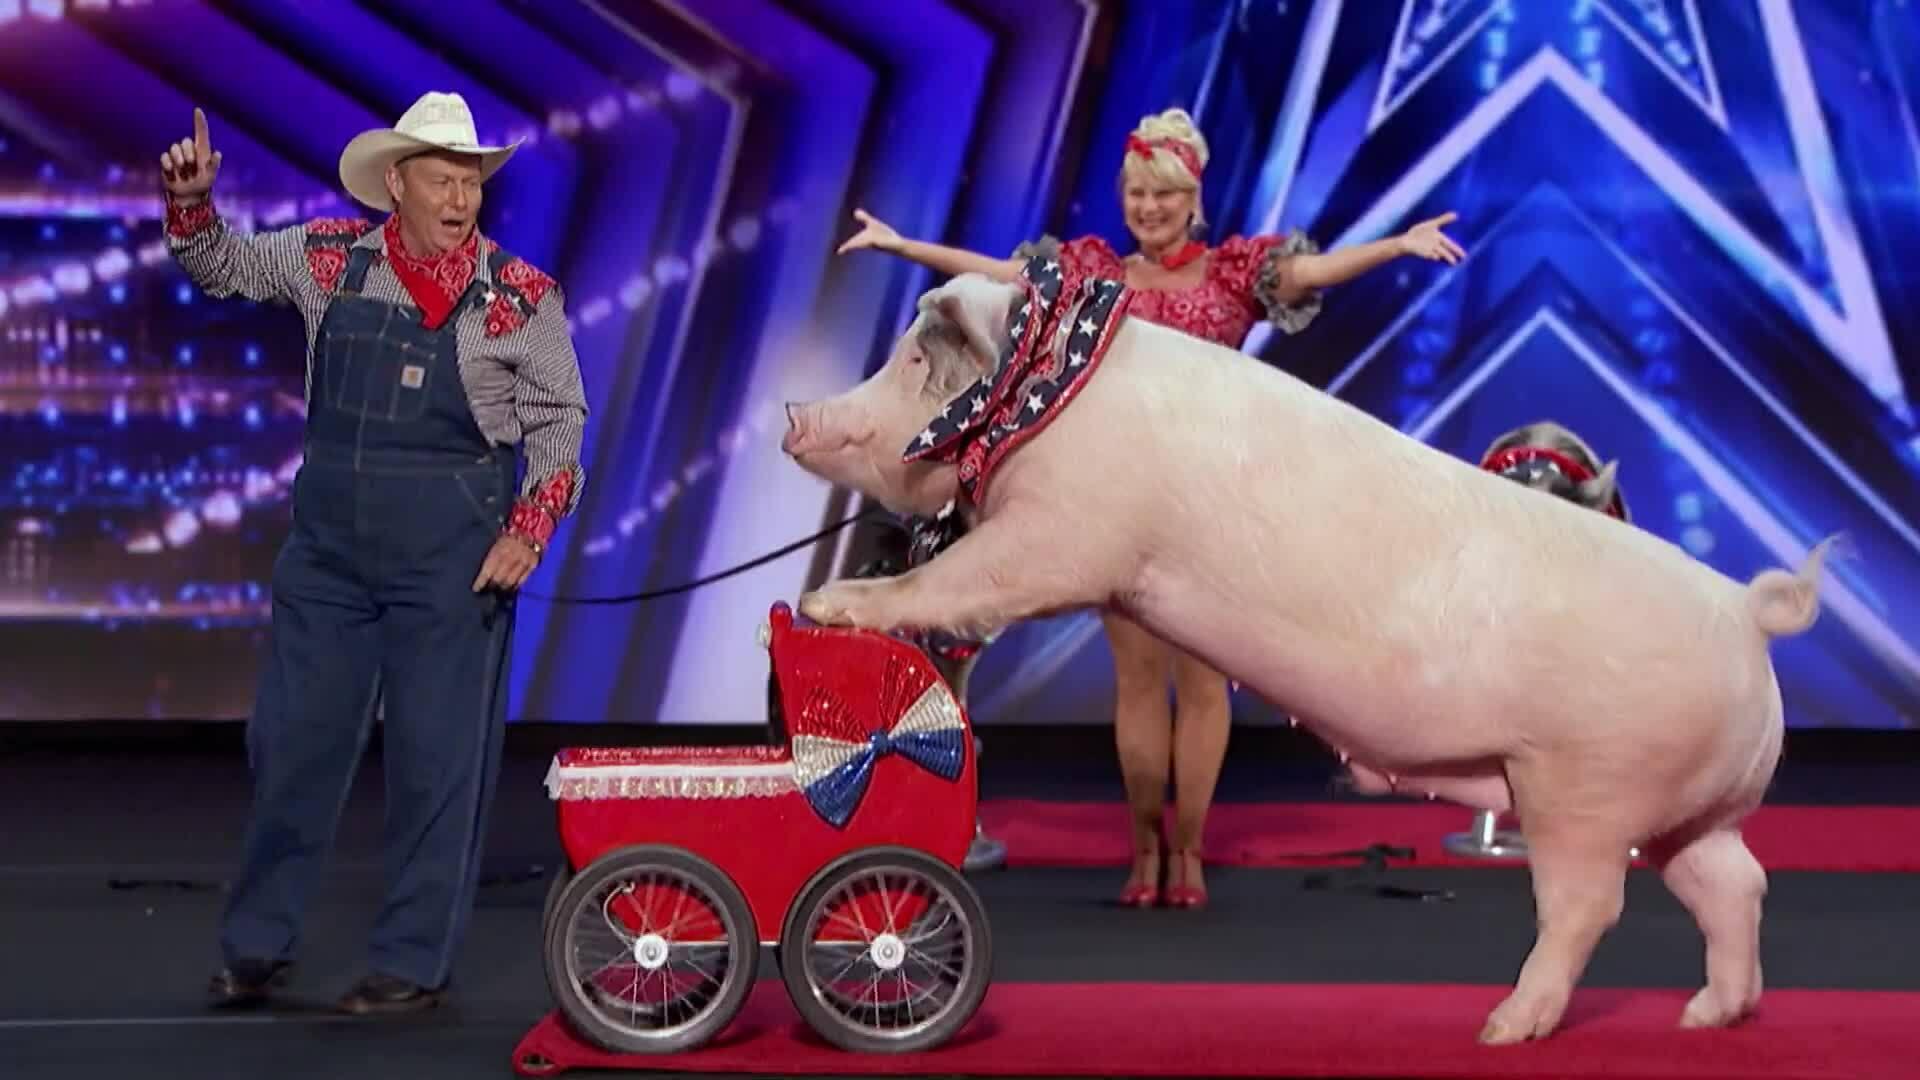 Xiếc lợn Pork Chop Revue America's Got Talent